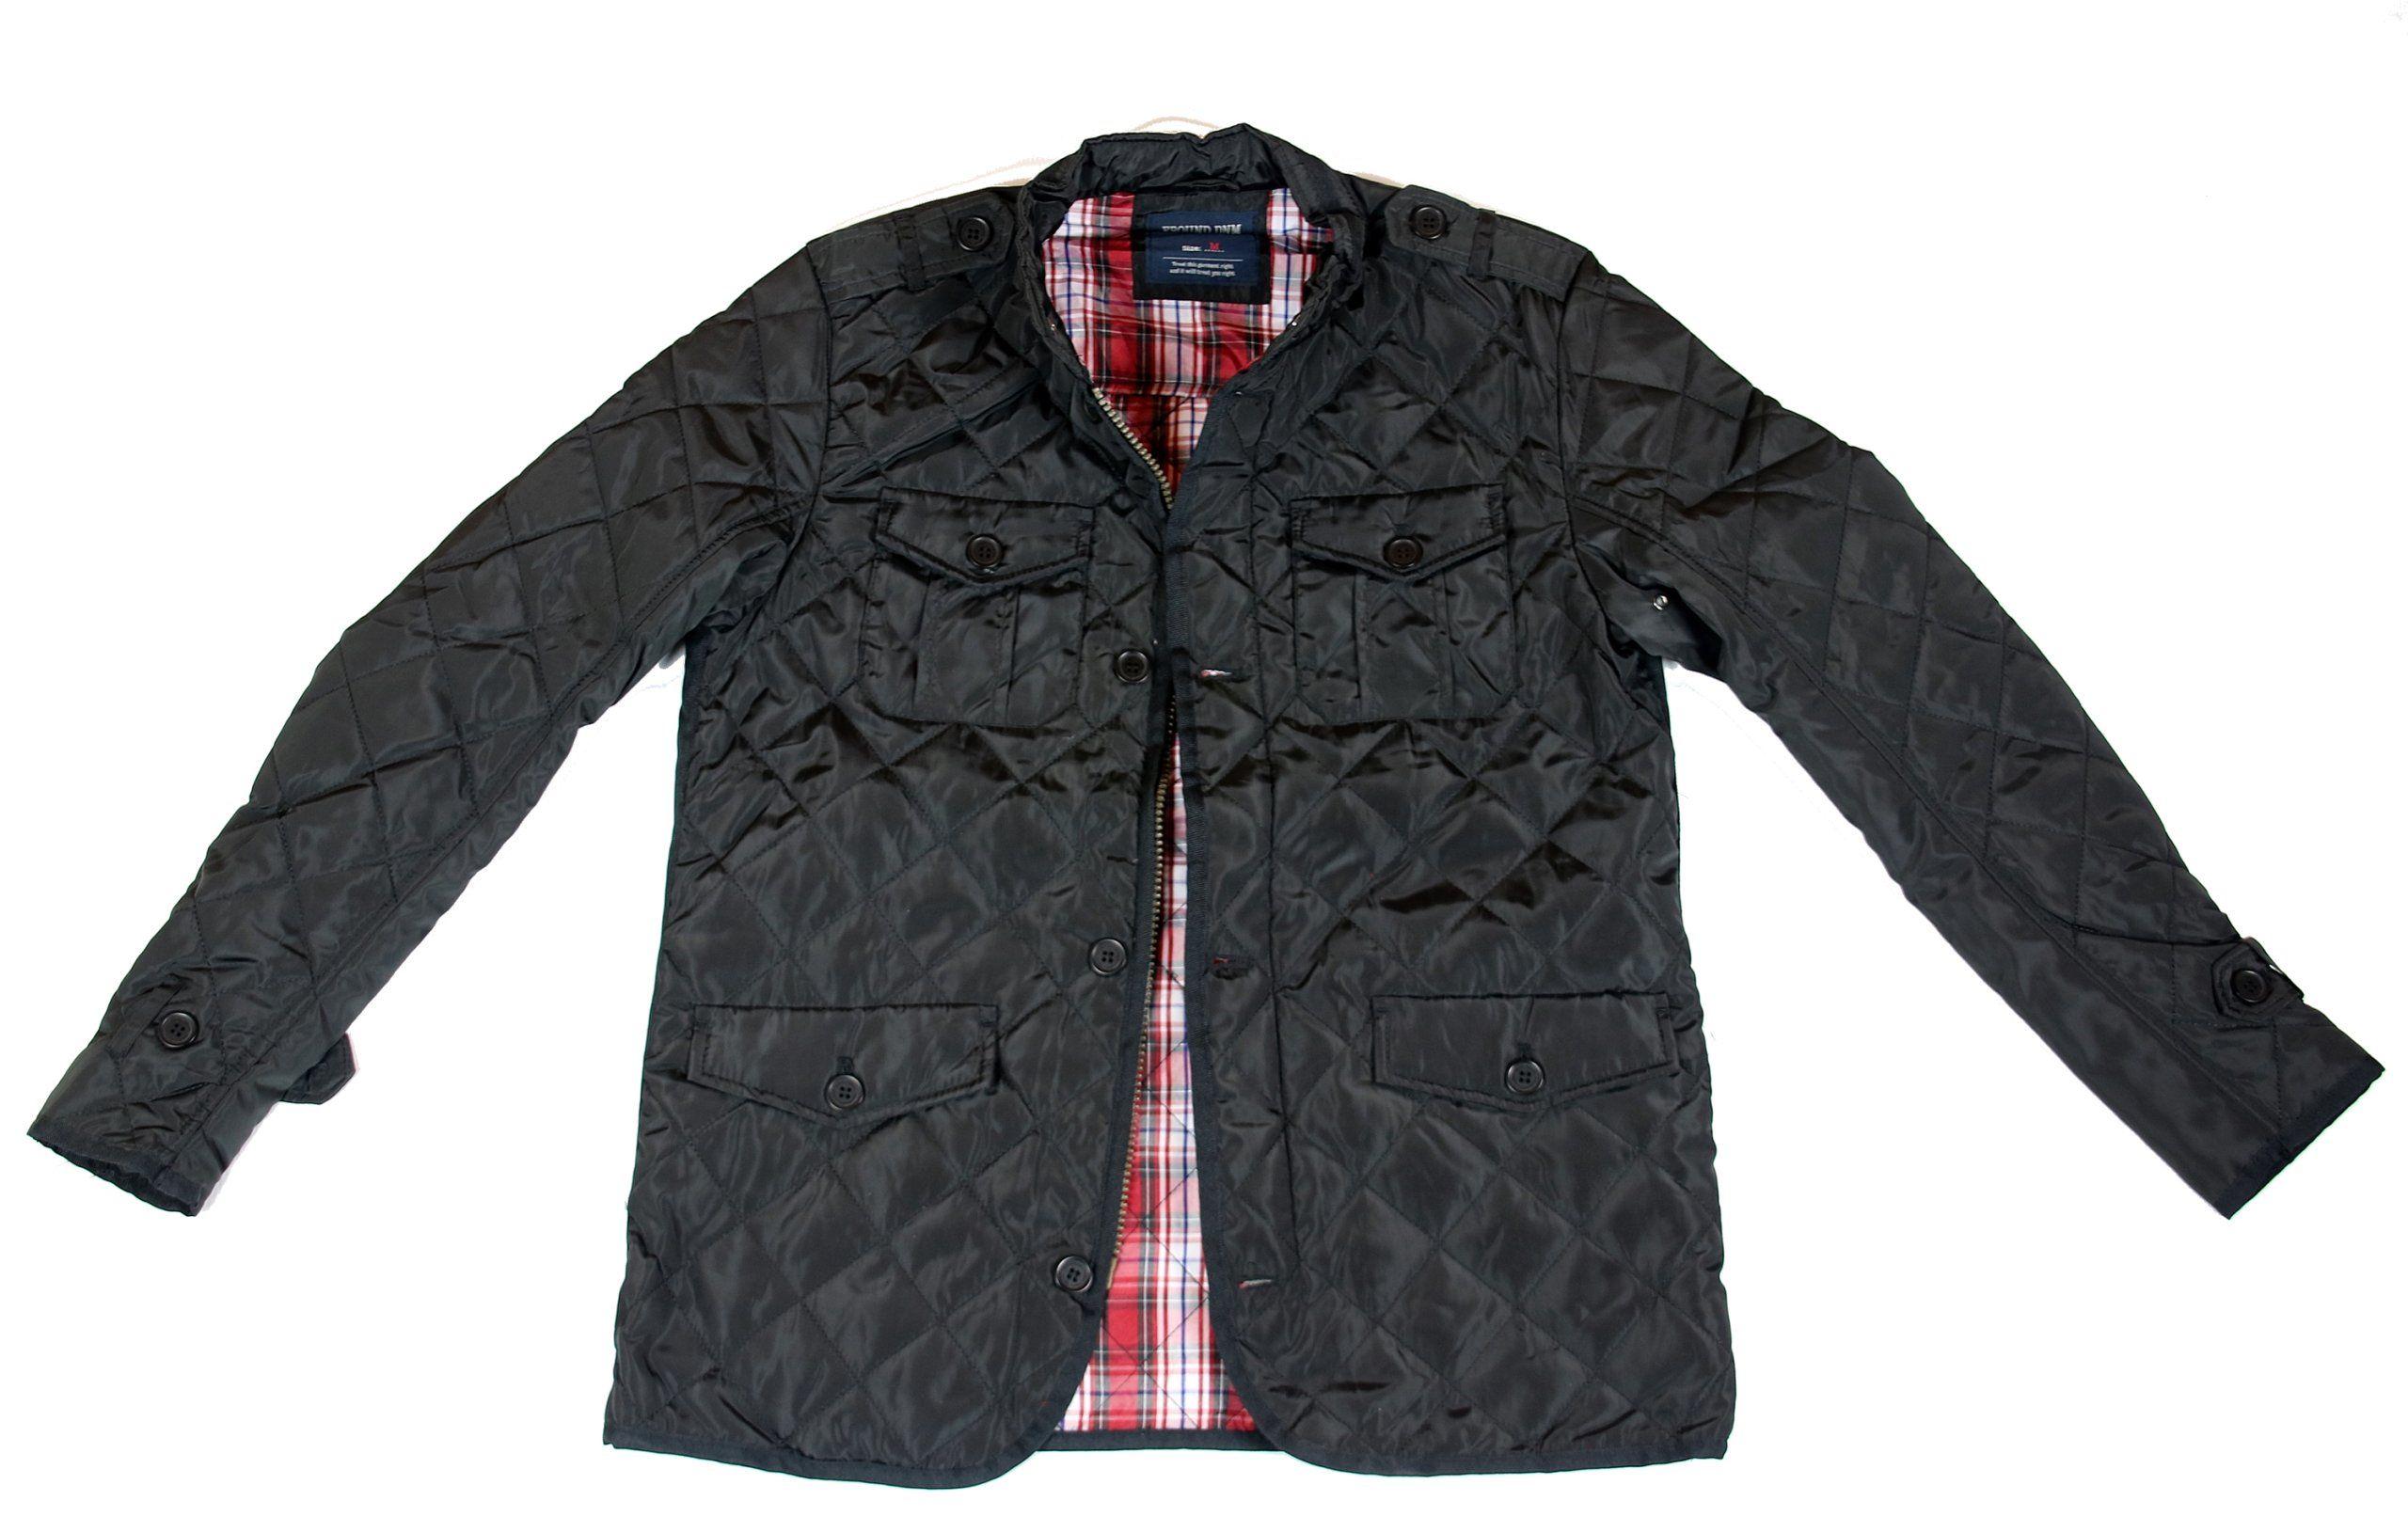 Kurtka Meska Wiosenna Czarna Elegancka 30 Xxl 7232852052 Oficjalne Archiwum Allegro Jackets Bomber Jacket Fashion